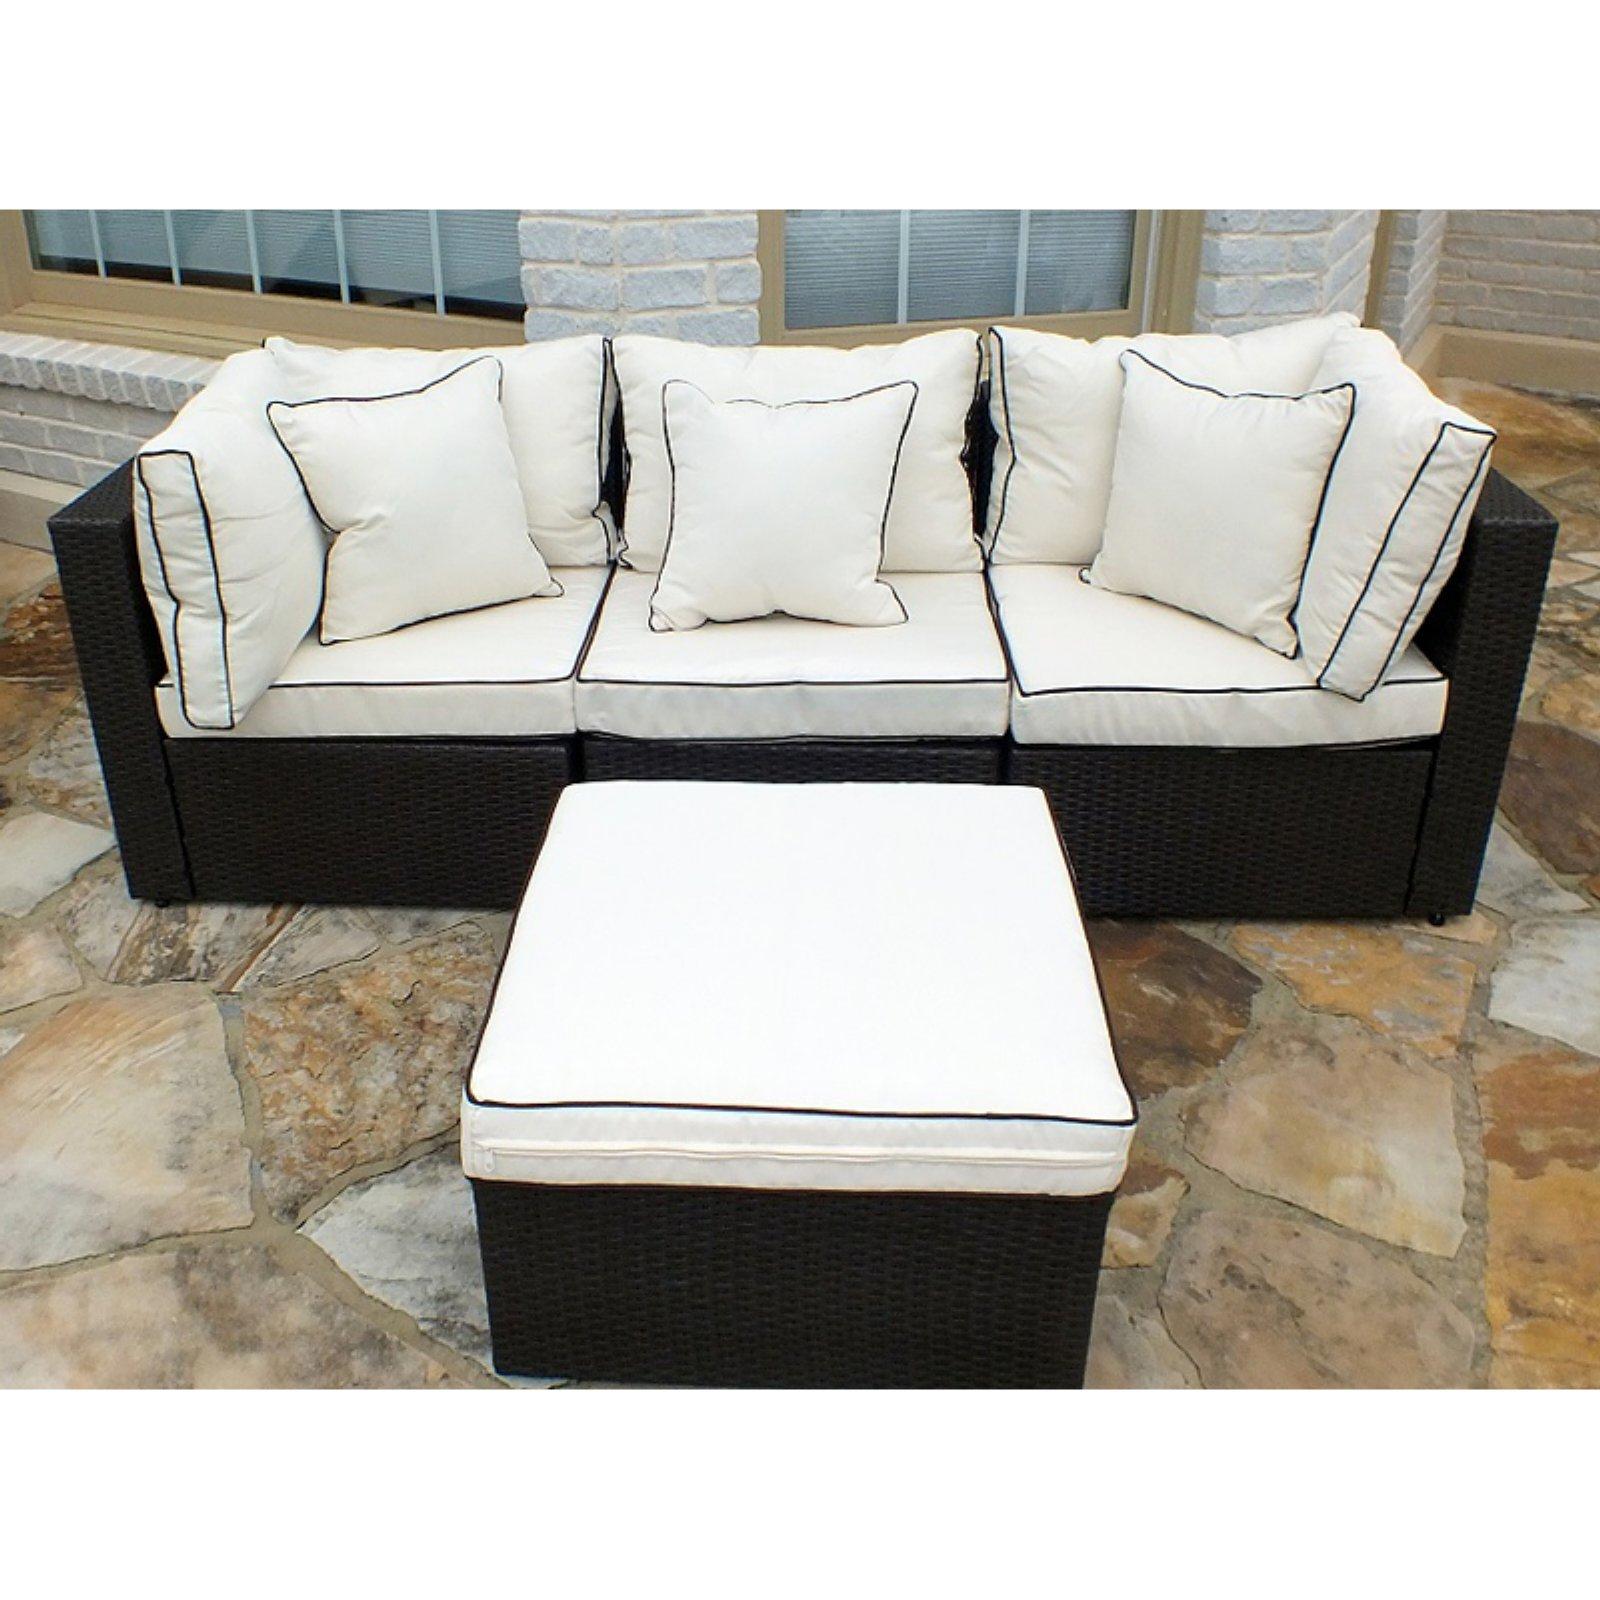 Jj International Hampton Wicker Patio Sofa With Ottoman In Well Liked Hamptons Sofas (View 8 of 15)